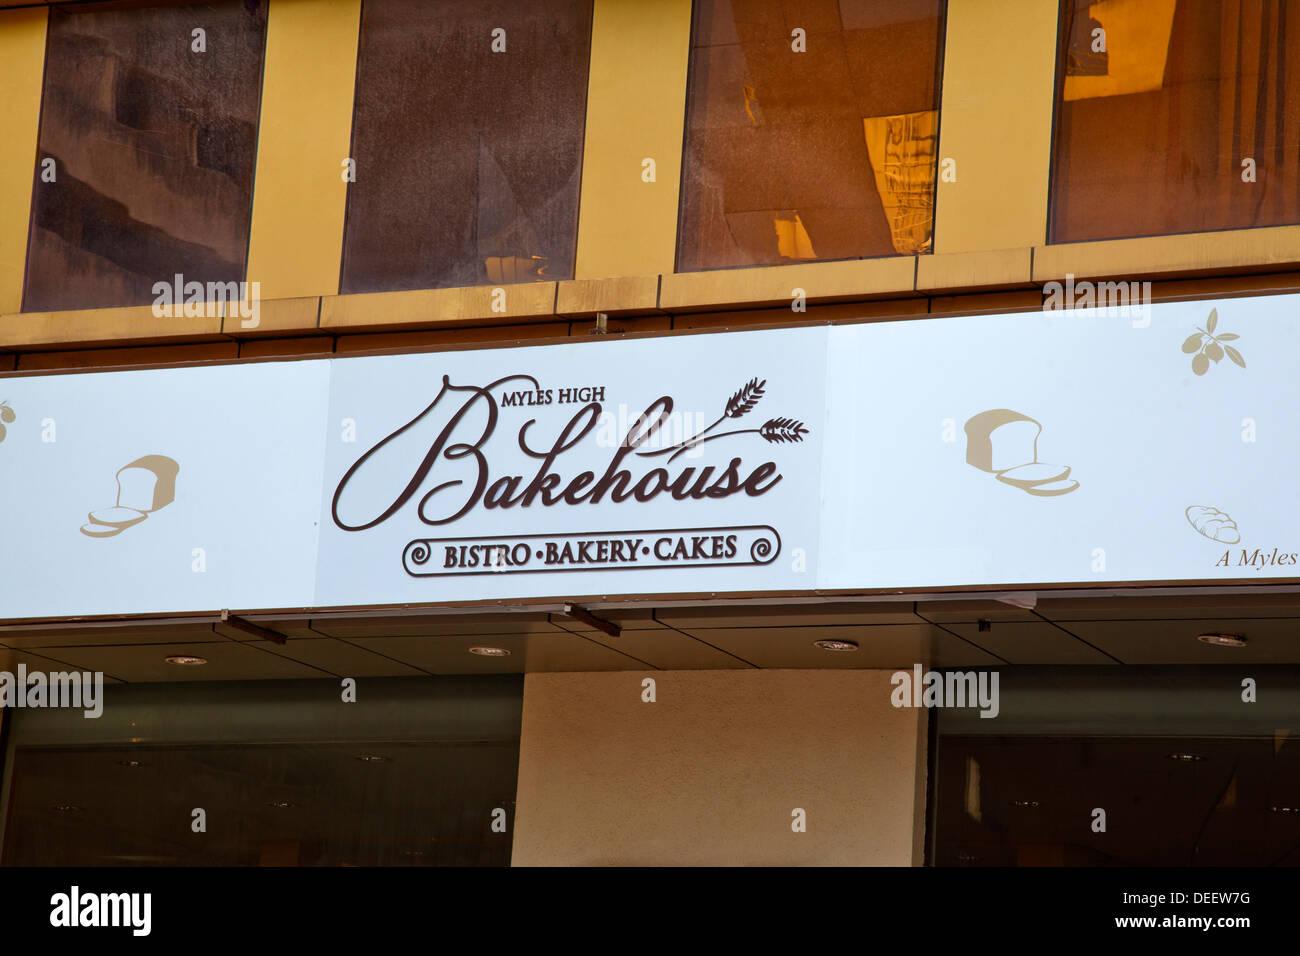 Sign board of a restaurant, Myles High Bakehouse, Panaji, North Goa, Goa, India - Stock Image